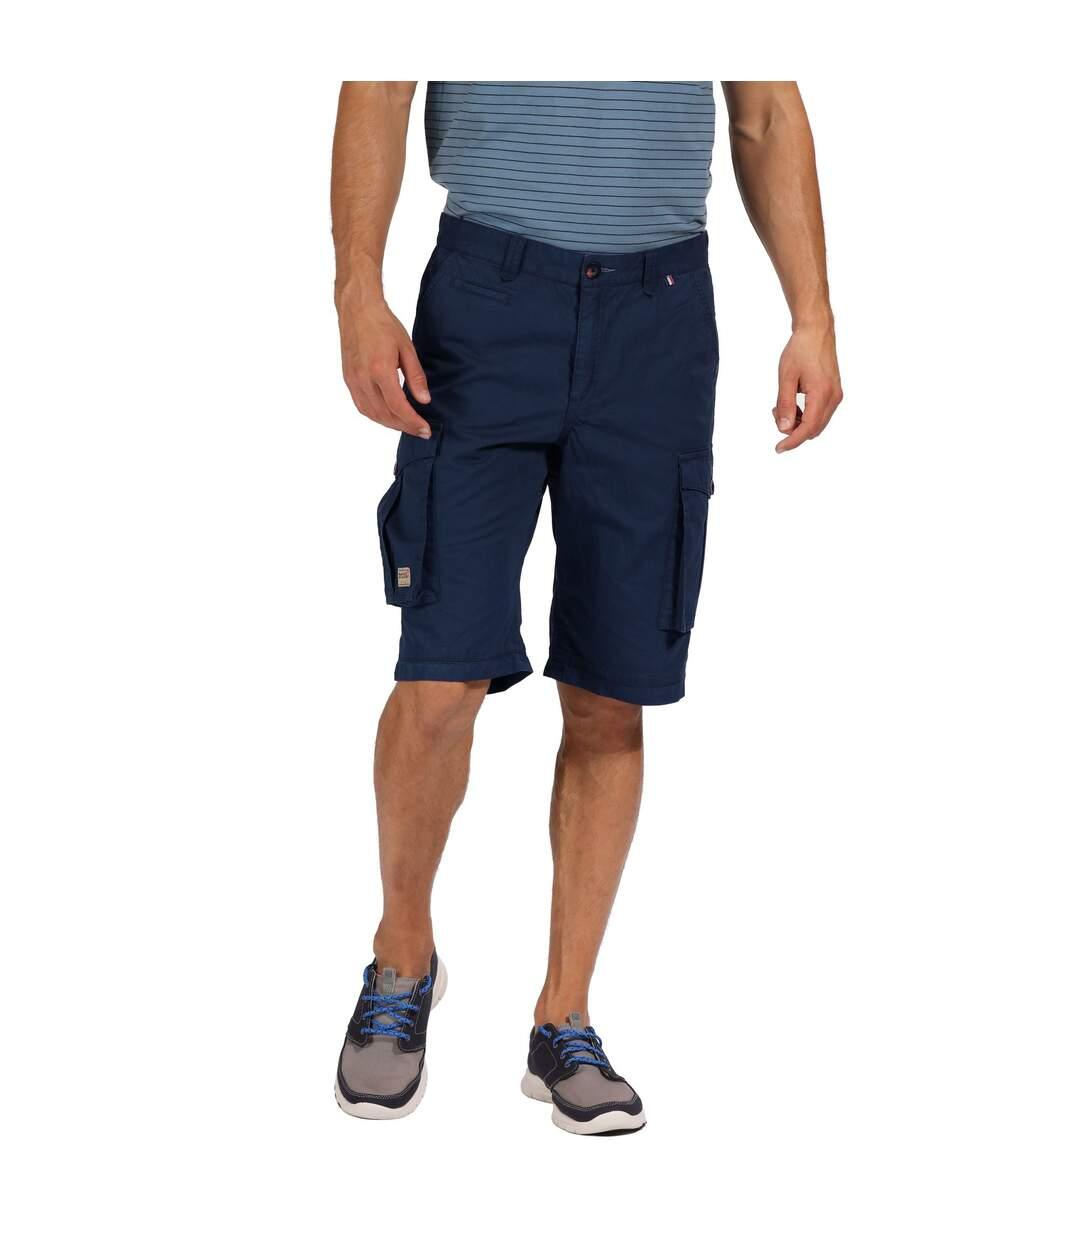 Regatta Mens Shorebay Vintage Cargo Shorts (Seal Grey) - UTRG4167